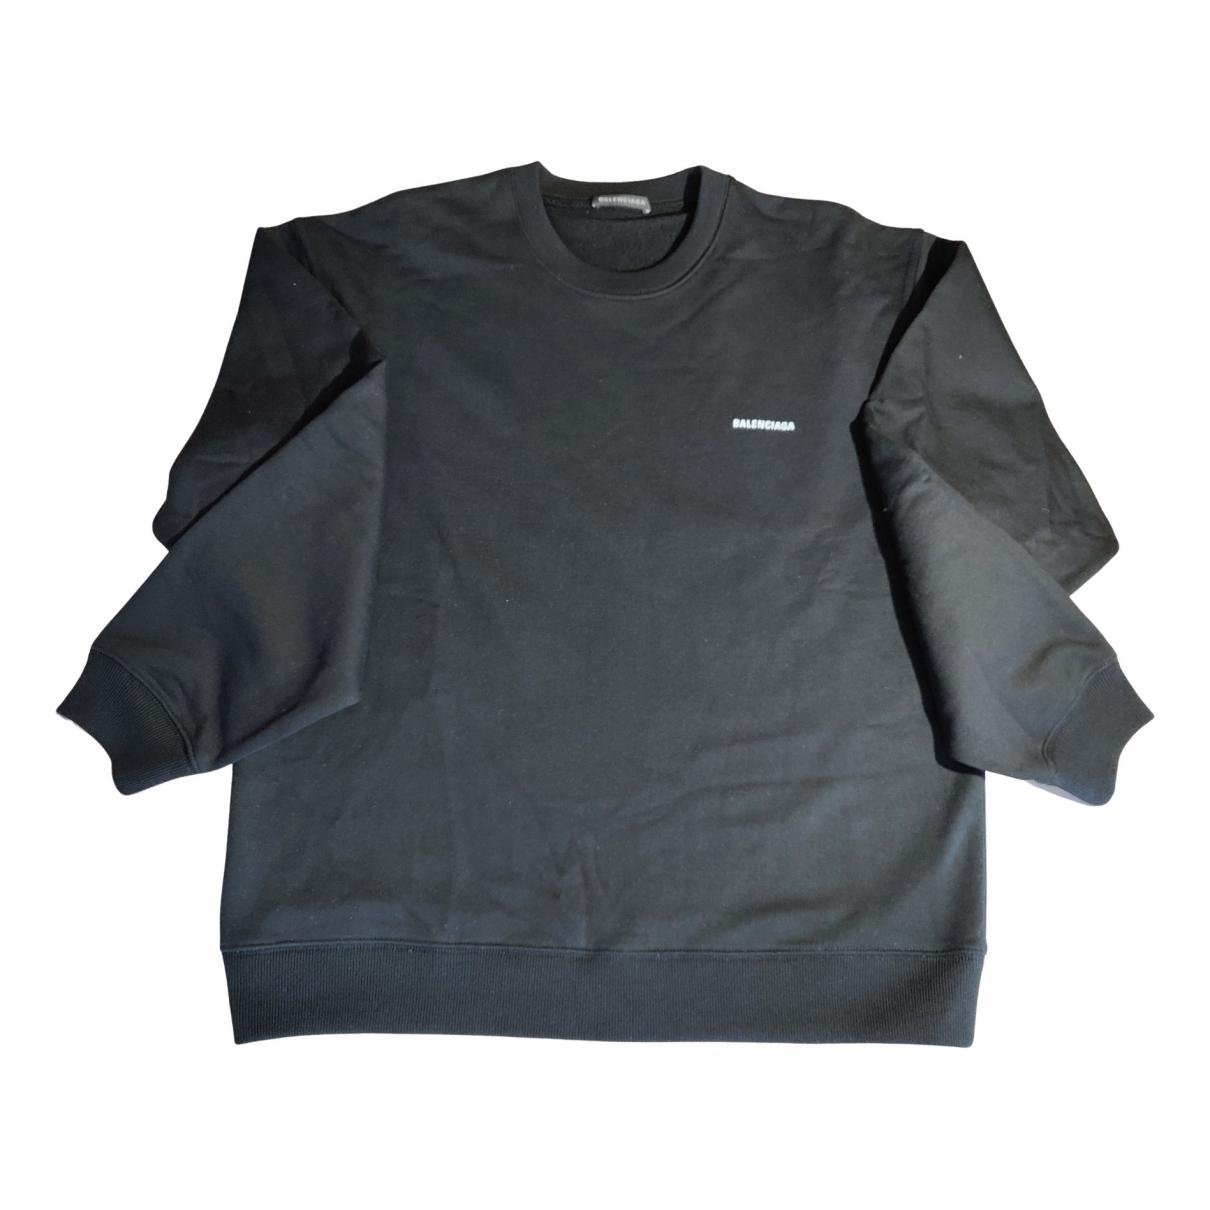 Balenciaga N Black Cotton Knitwear & Sweatshirts for Men S International